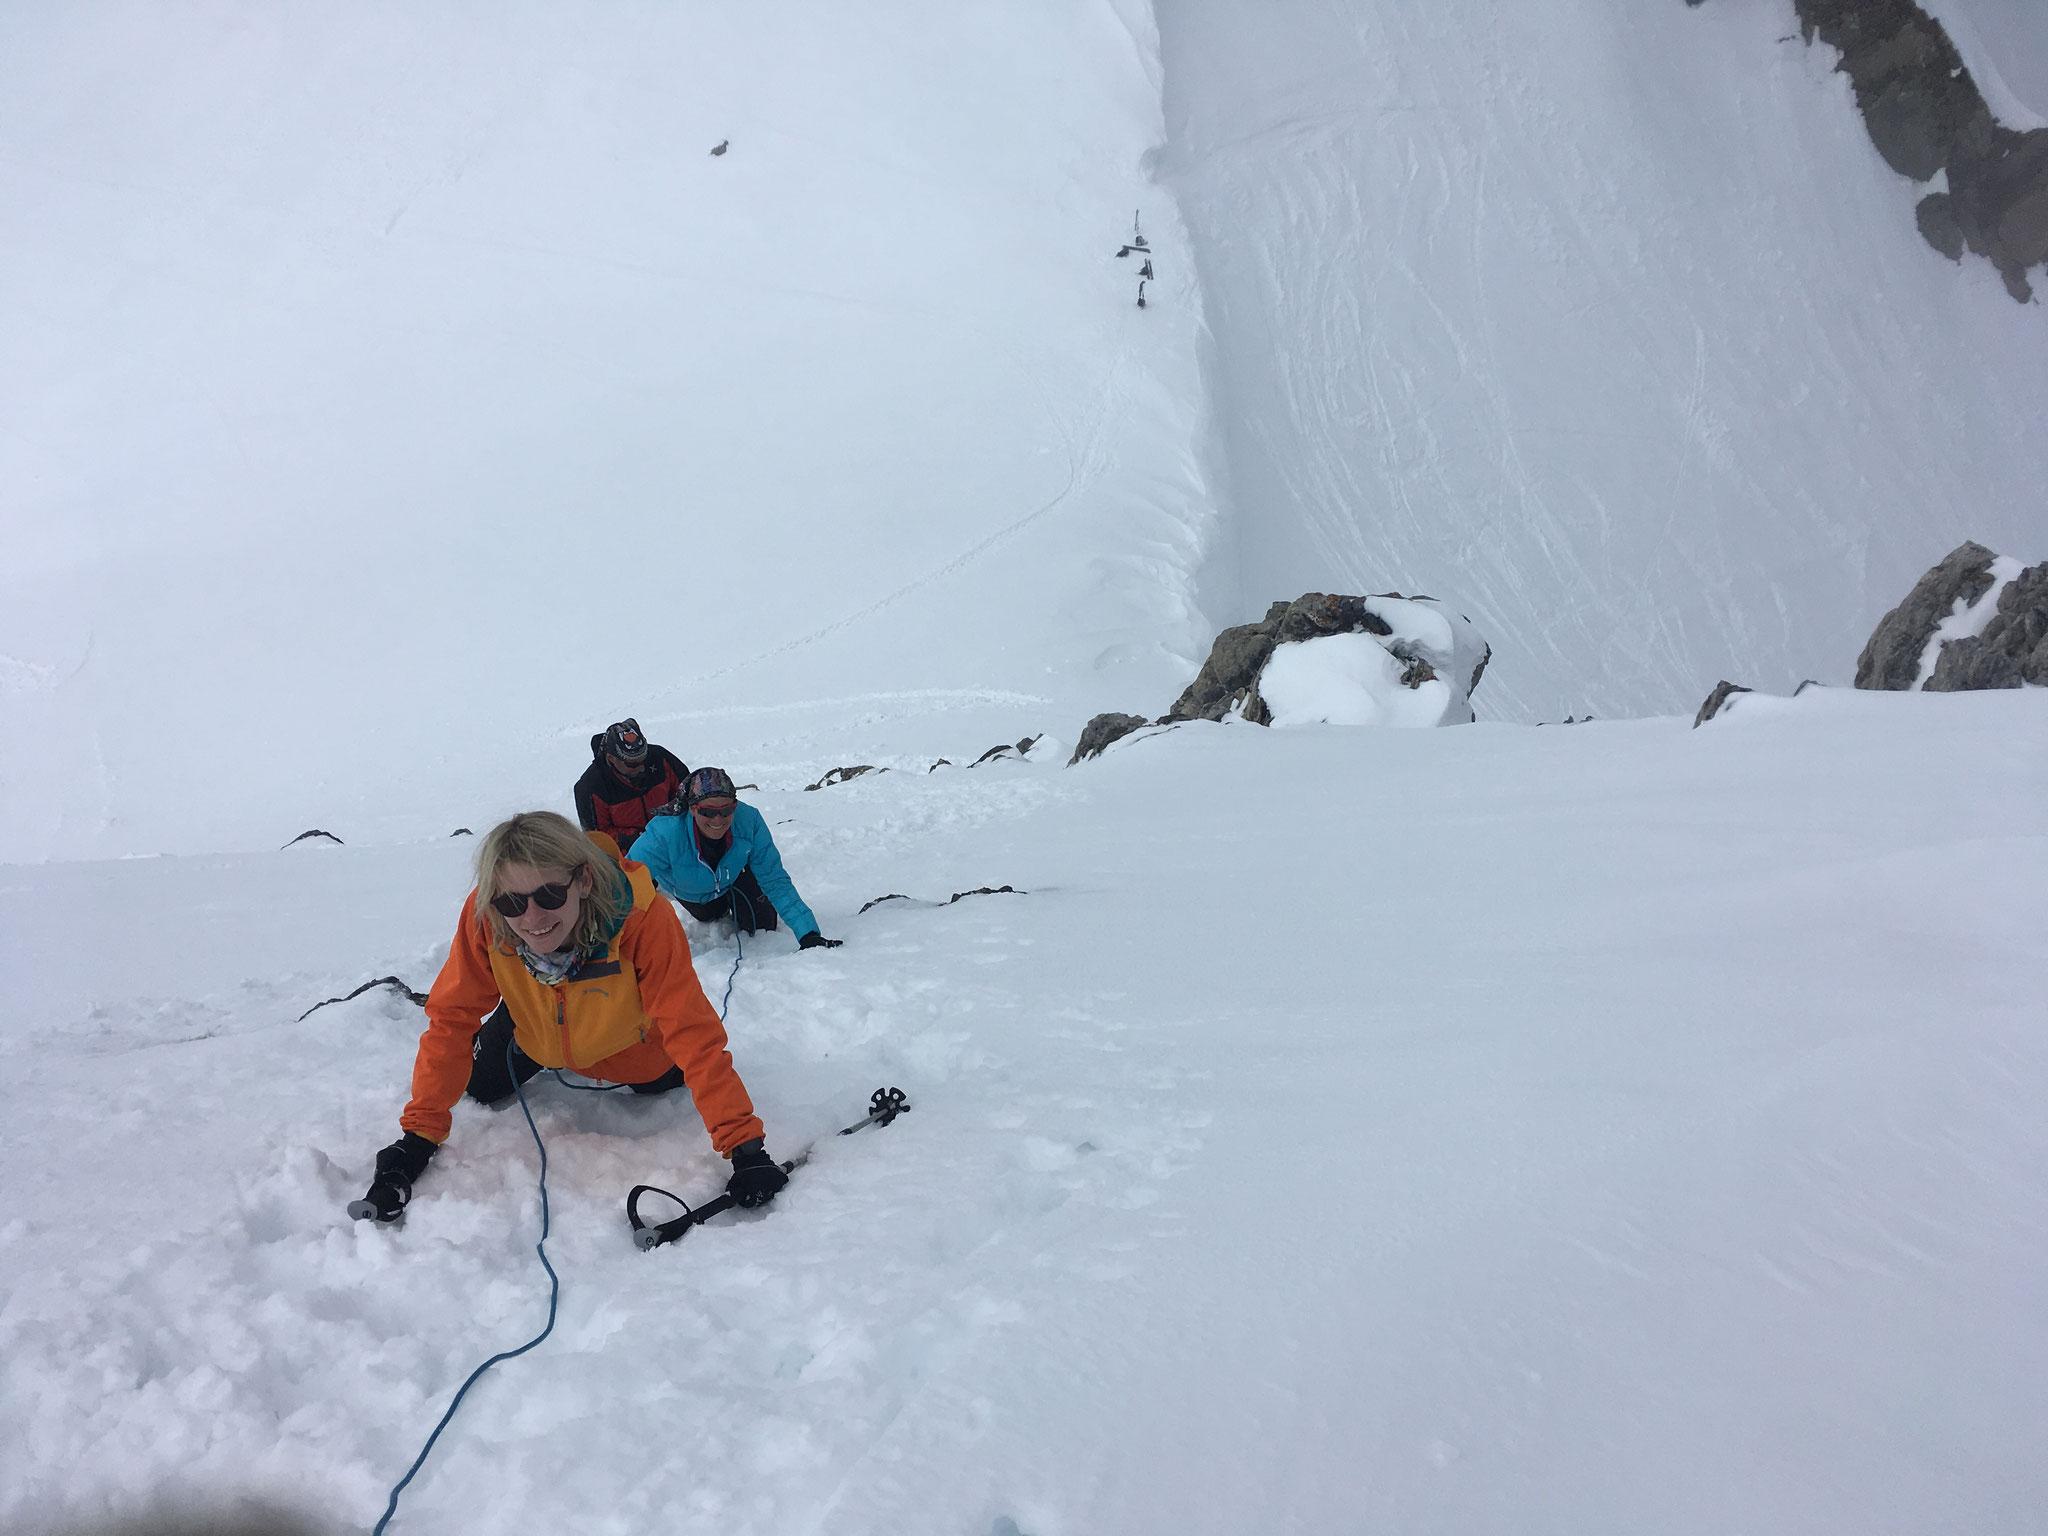 Encordés, crampons au pieds, escalade au-dessus du Col de La Cicle